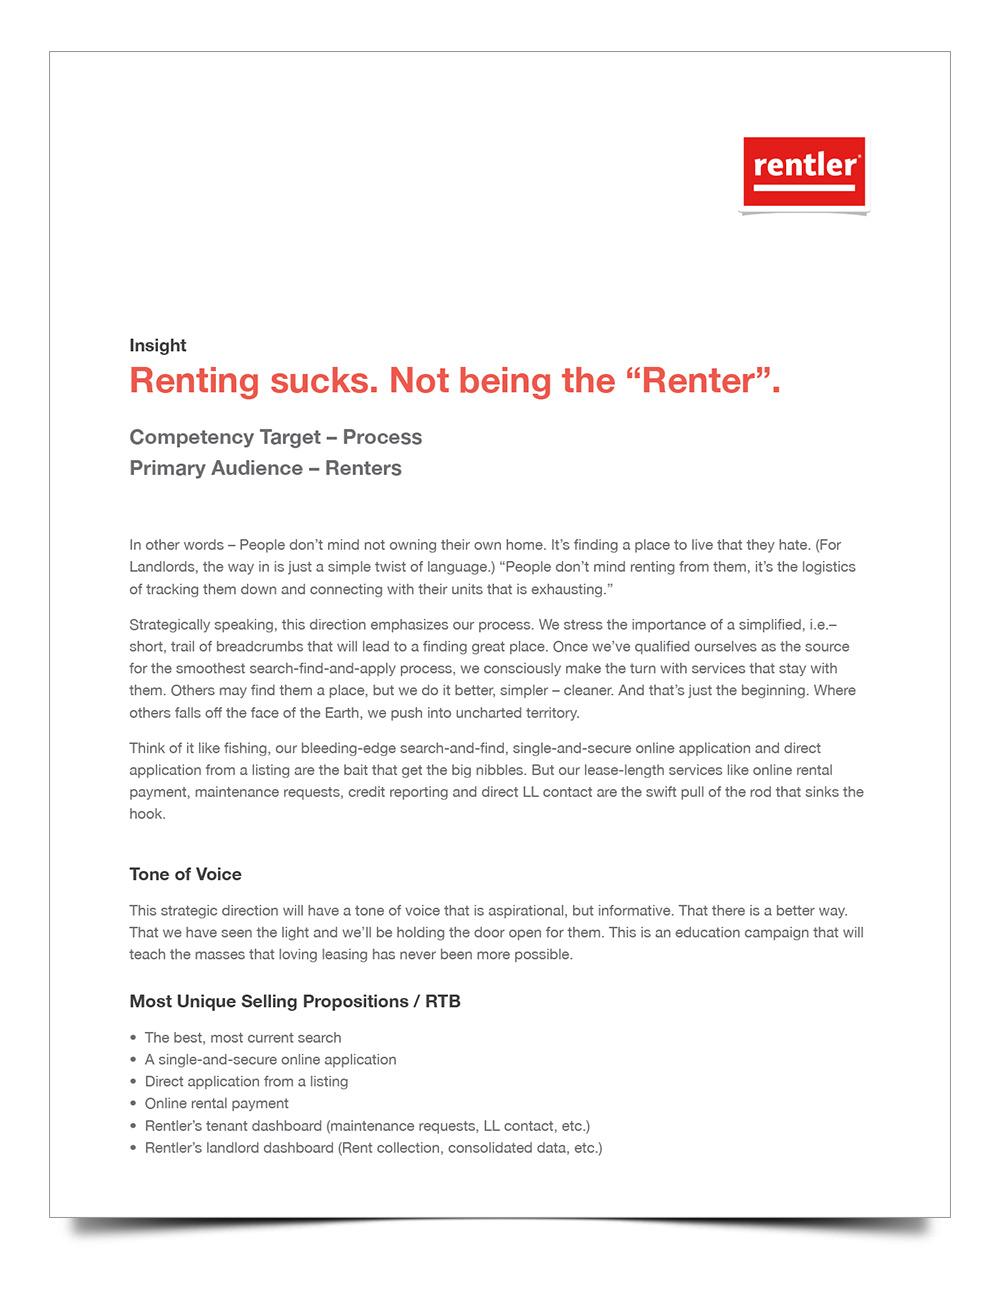 Rentler_SD_Renting.jpg